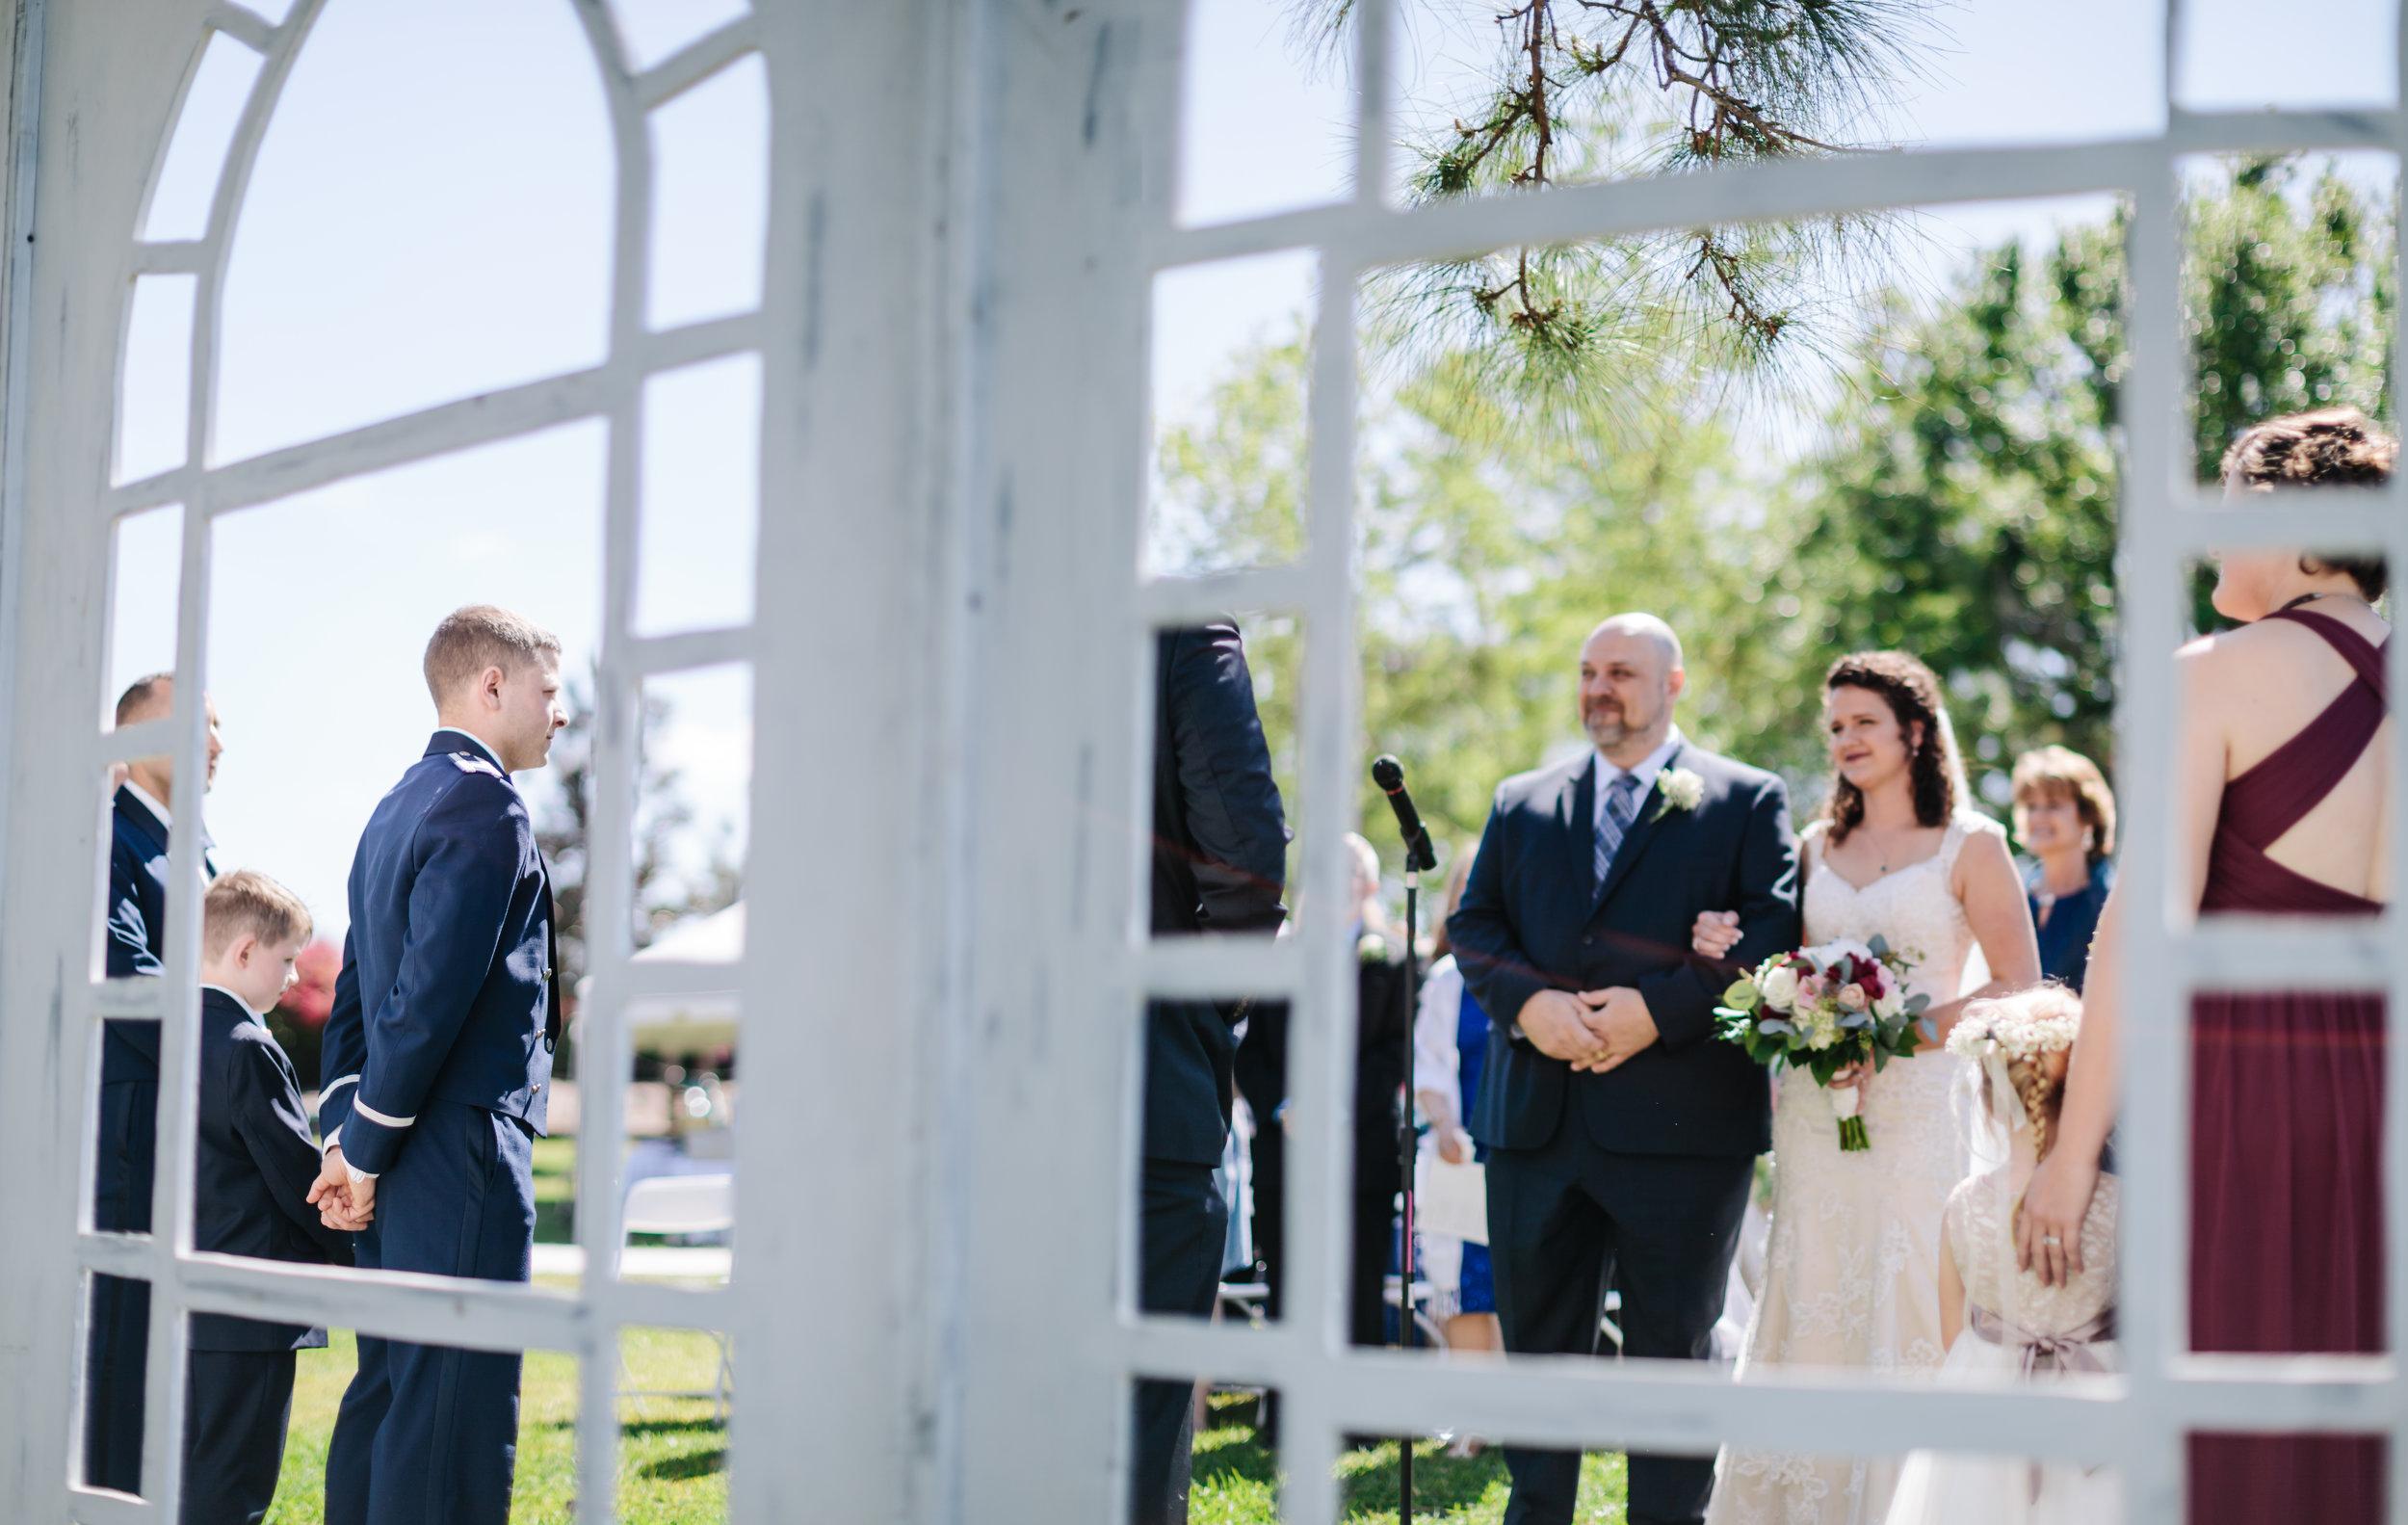 2018.03.17 Allison and Chuck Wedding Waelti Melbourne (247 of 900).jpg